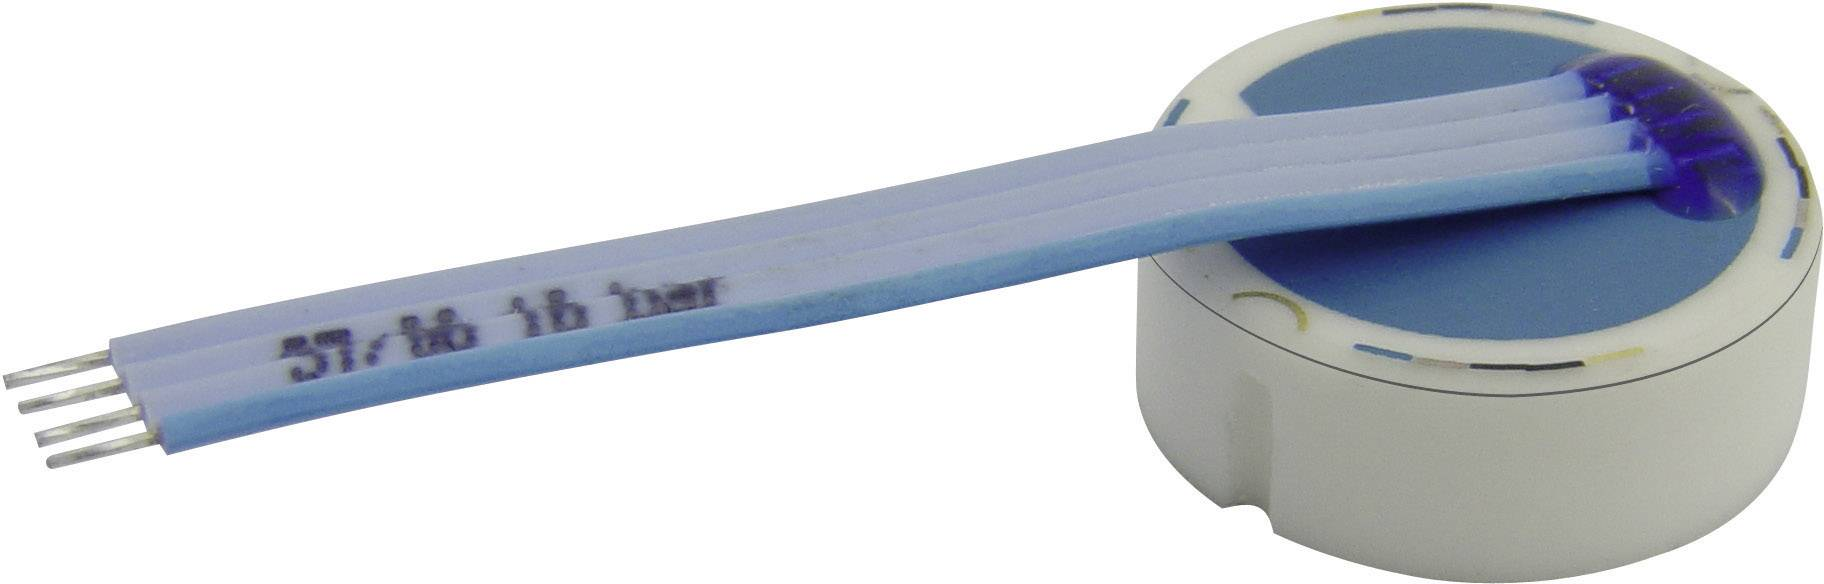 Keramický senzor relativního tlaku, 2,5 bar, B+B Thermotechnik, DS-KE-D-R2B5